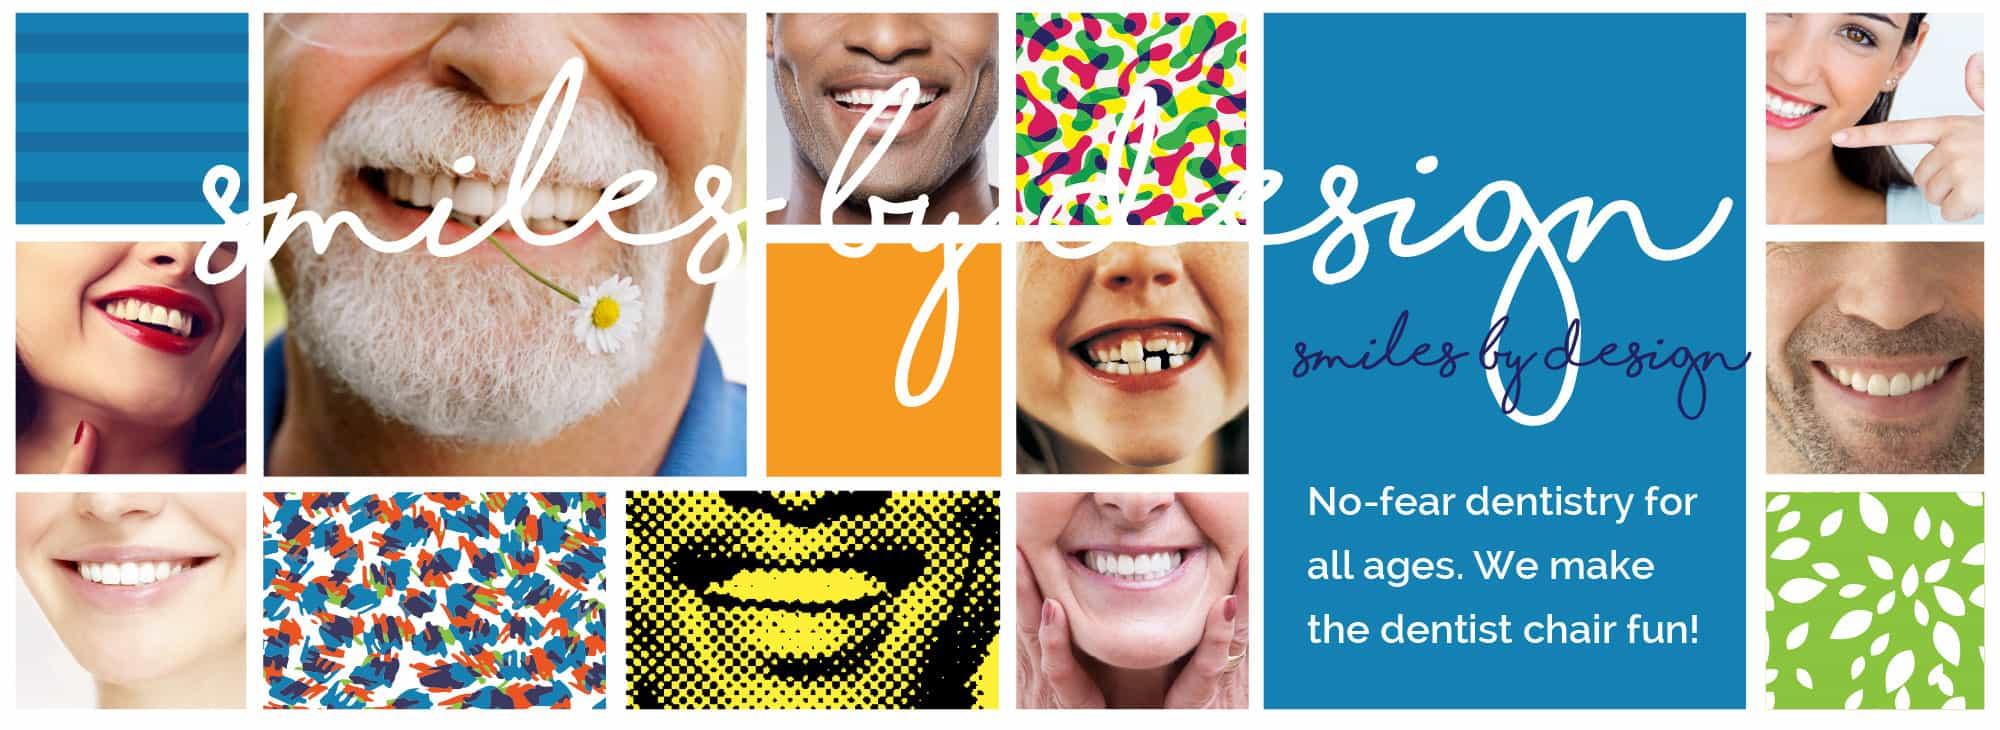 home-headerlarge_02-family dentist wichita-Kristyn Barker-Smiles by Design-Wichita, KS